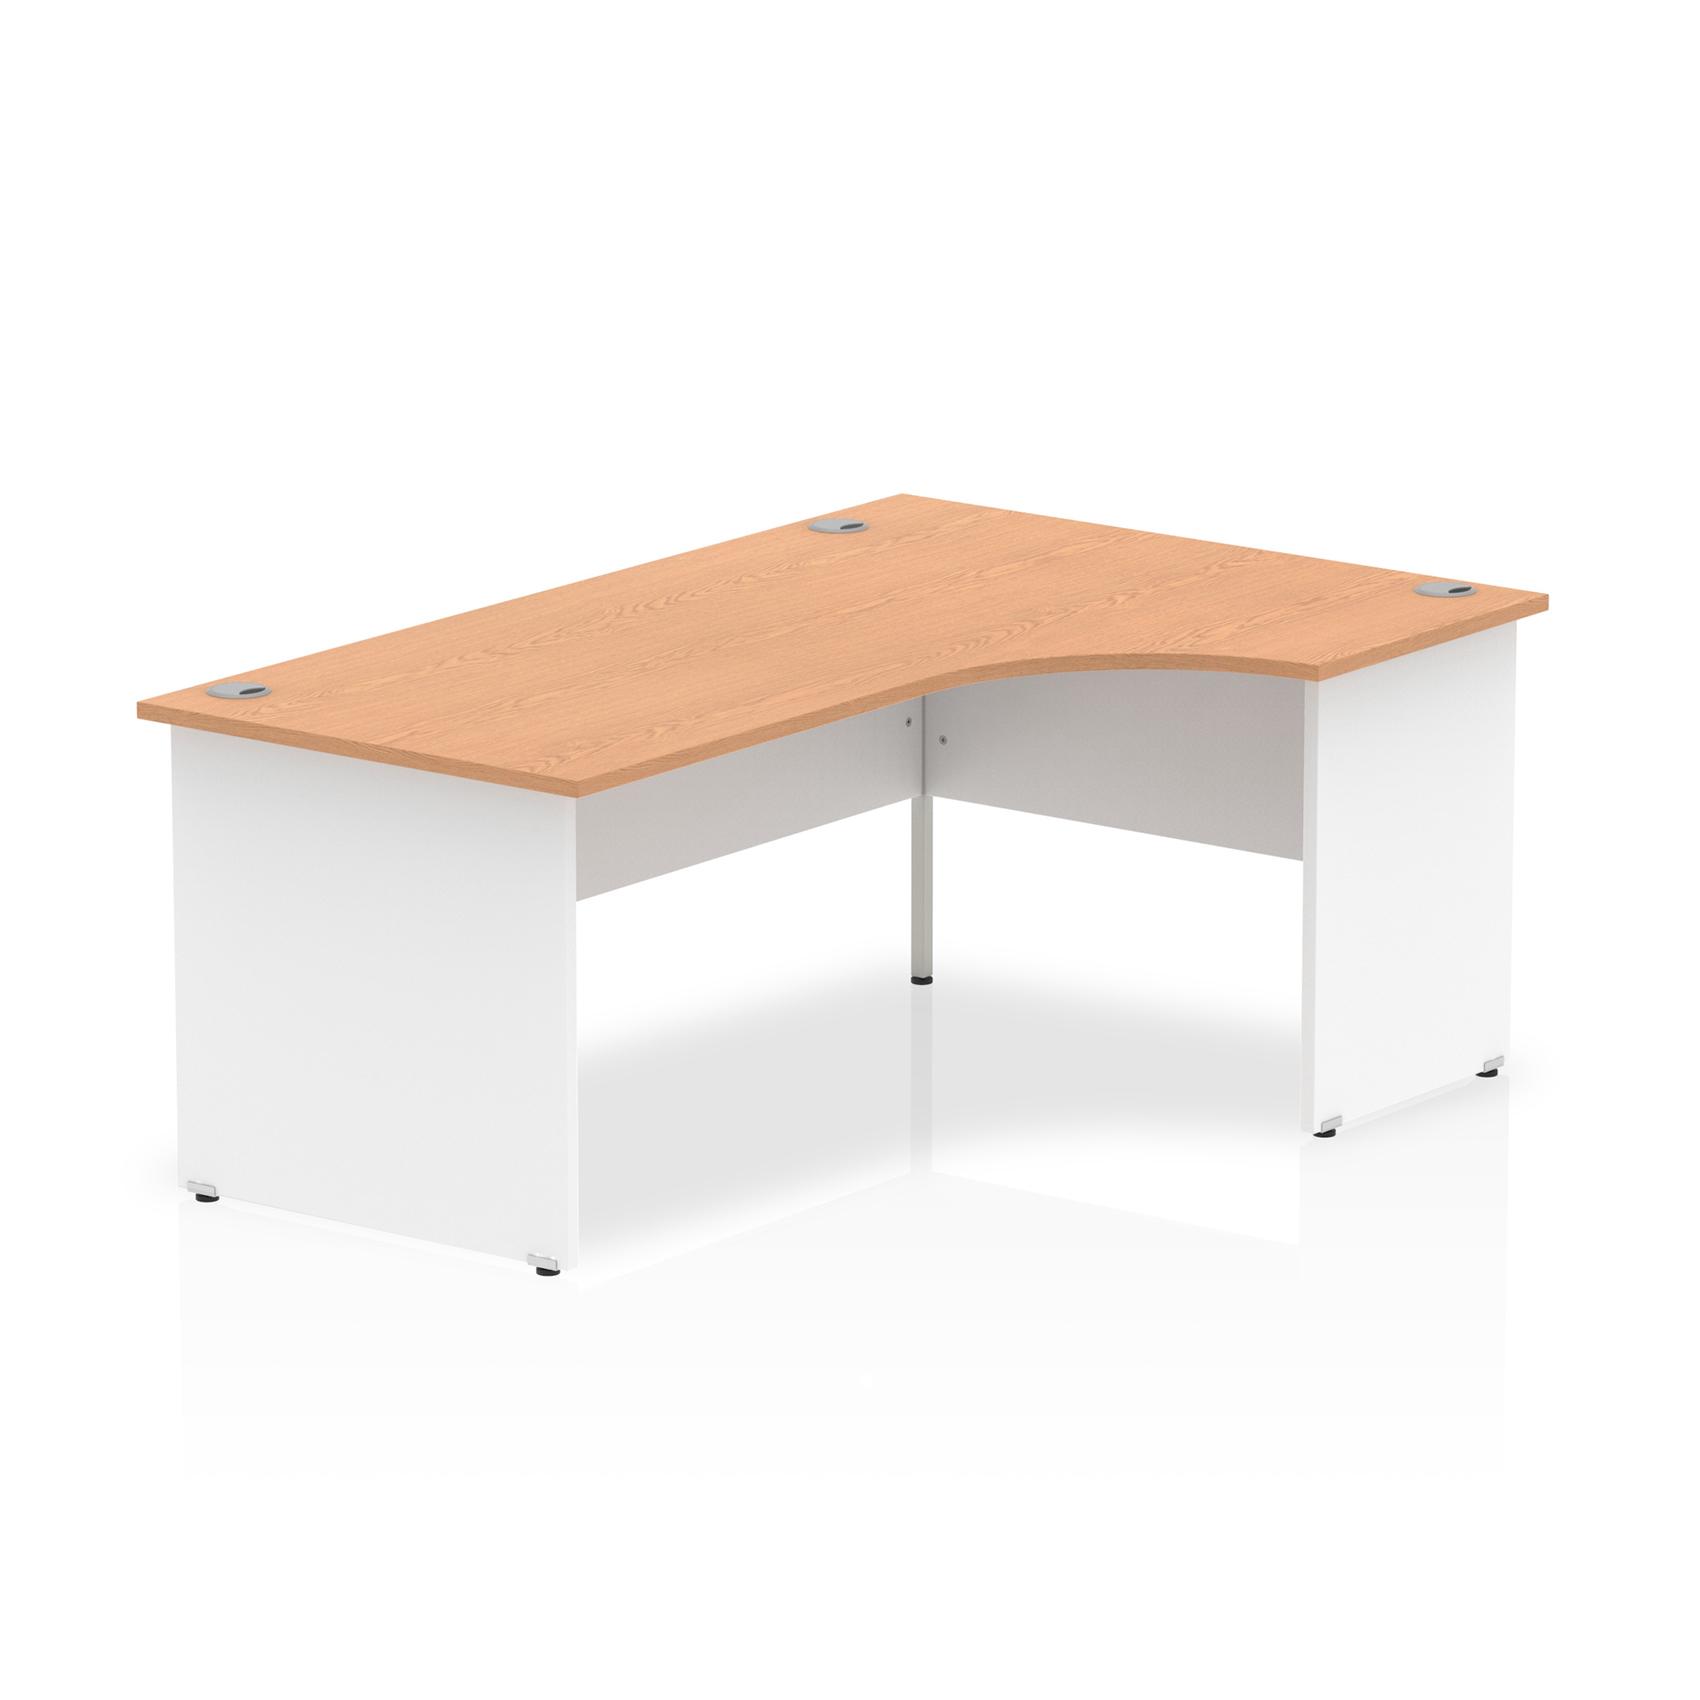 Trexus Desk Crescent Right Hand Panel End 1800x800mm Oak Top White Panels Ref TT000047